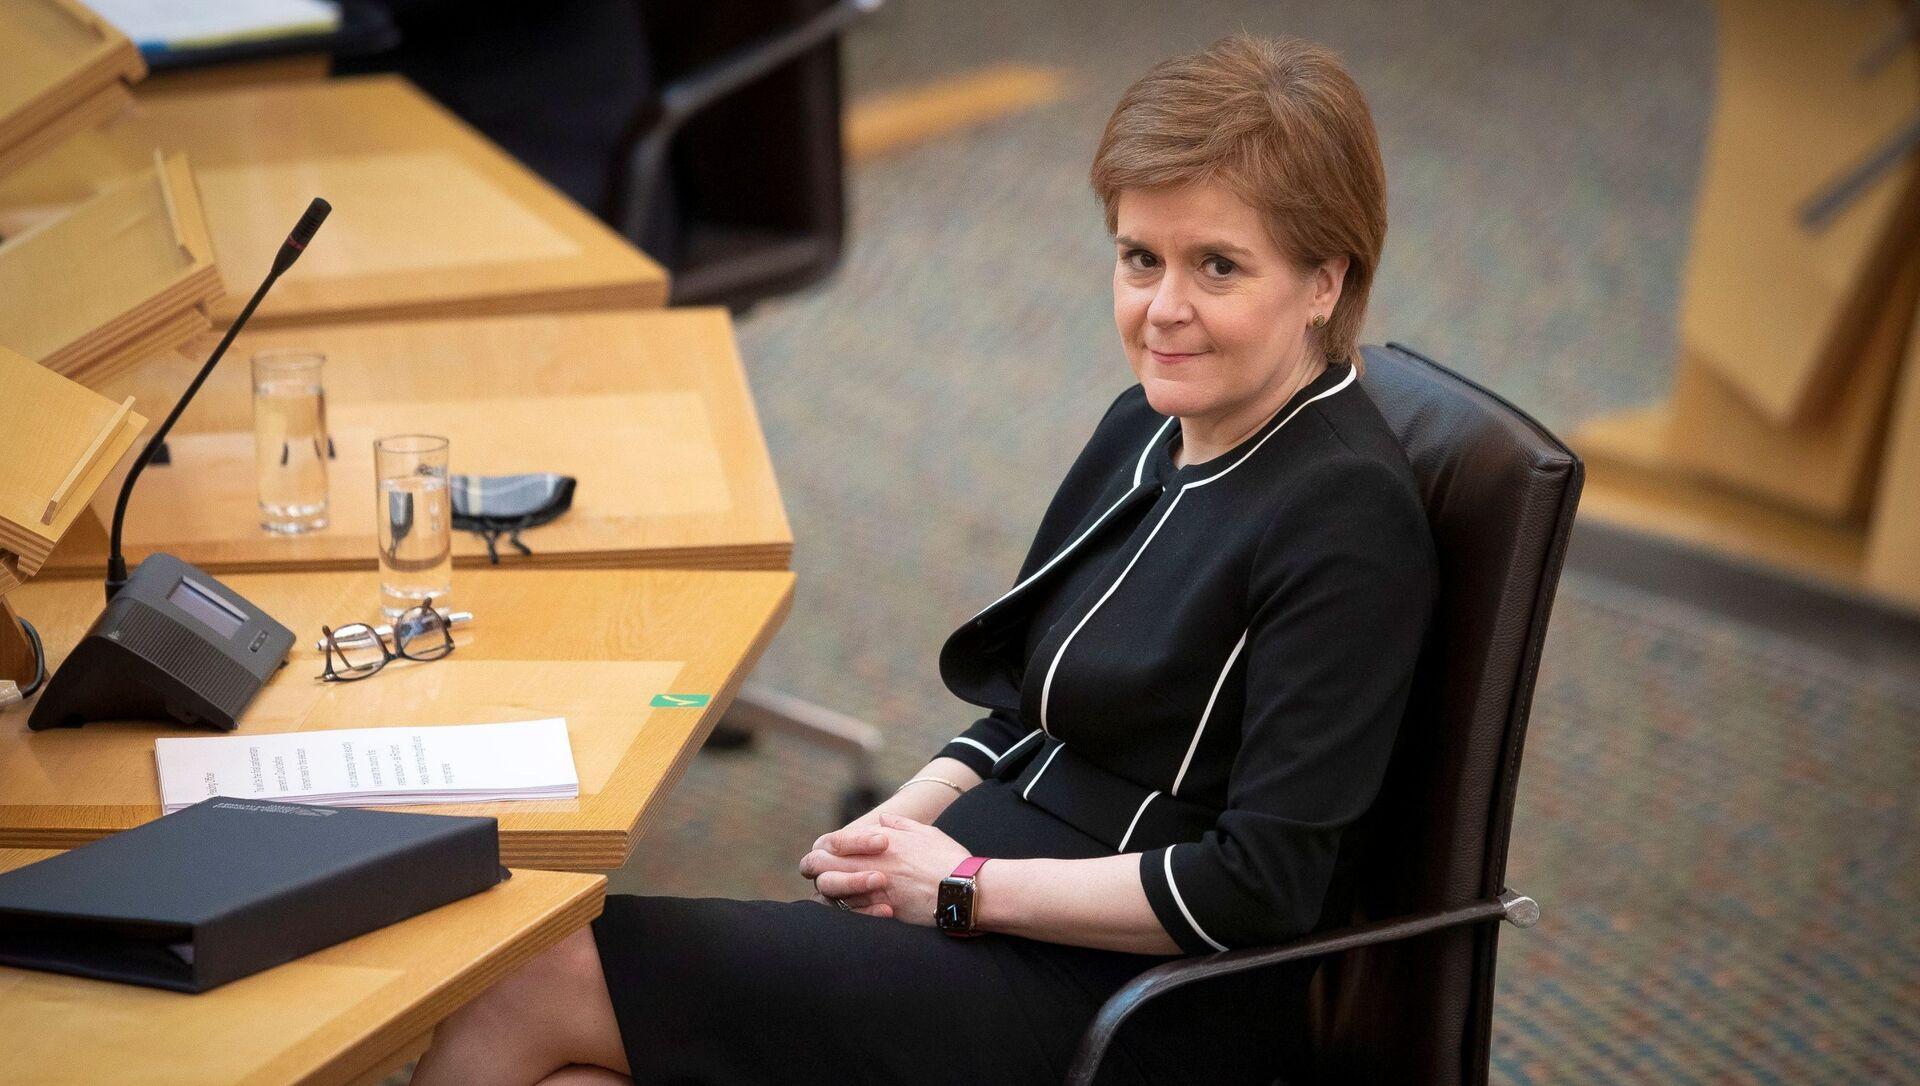 Scotland's First Minister Nicola Sturgeon sits at the main chamber ahead of a coronavirus disease (COVID-19) briefing at the Scottish Parliament in Holyrood, Edinburgh, Scotland, Britain March 23, 2021. - Sputnik International, 1920, 04.05.2021